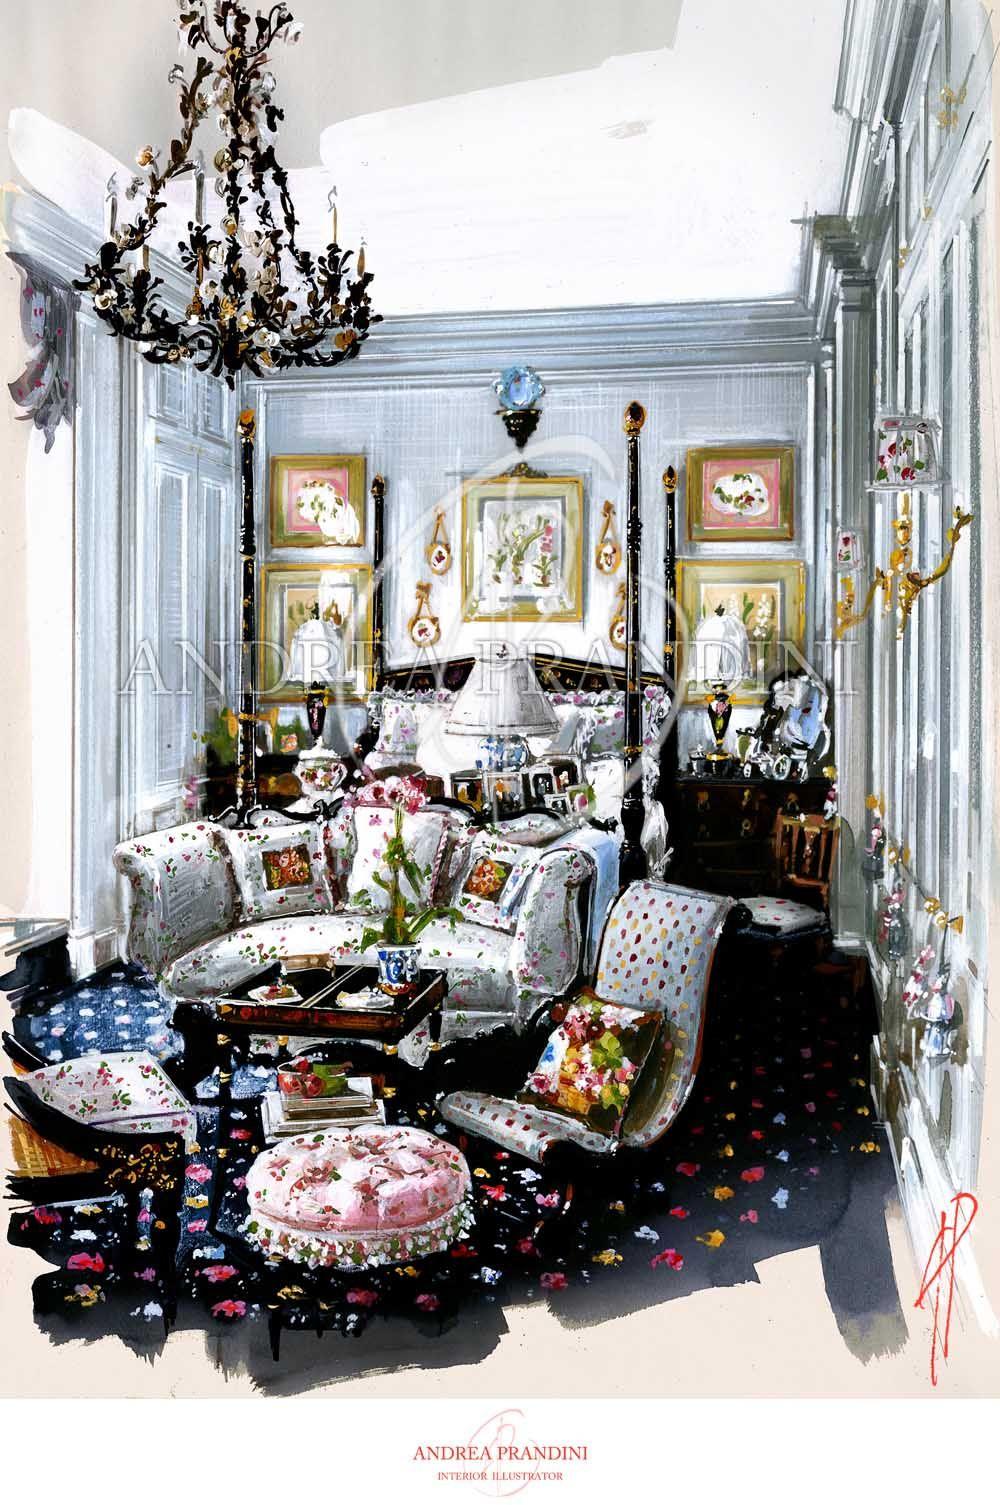 Interior Illustration And Visualization Watercolor